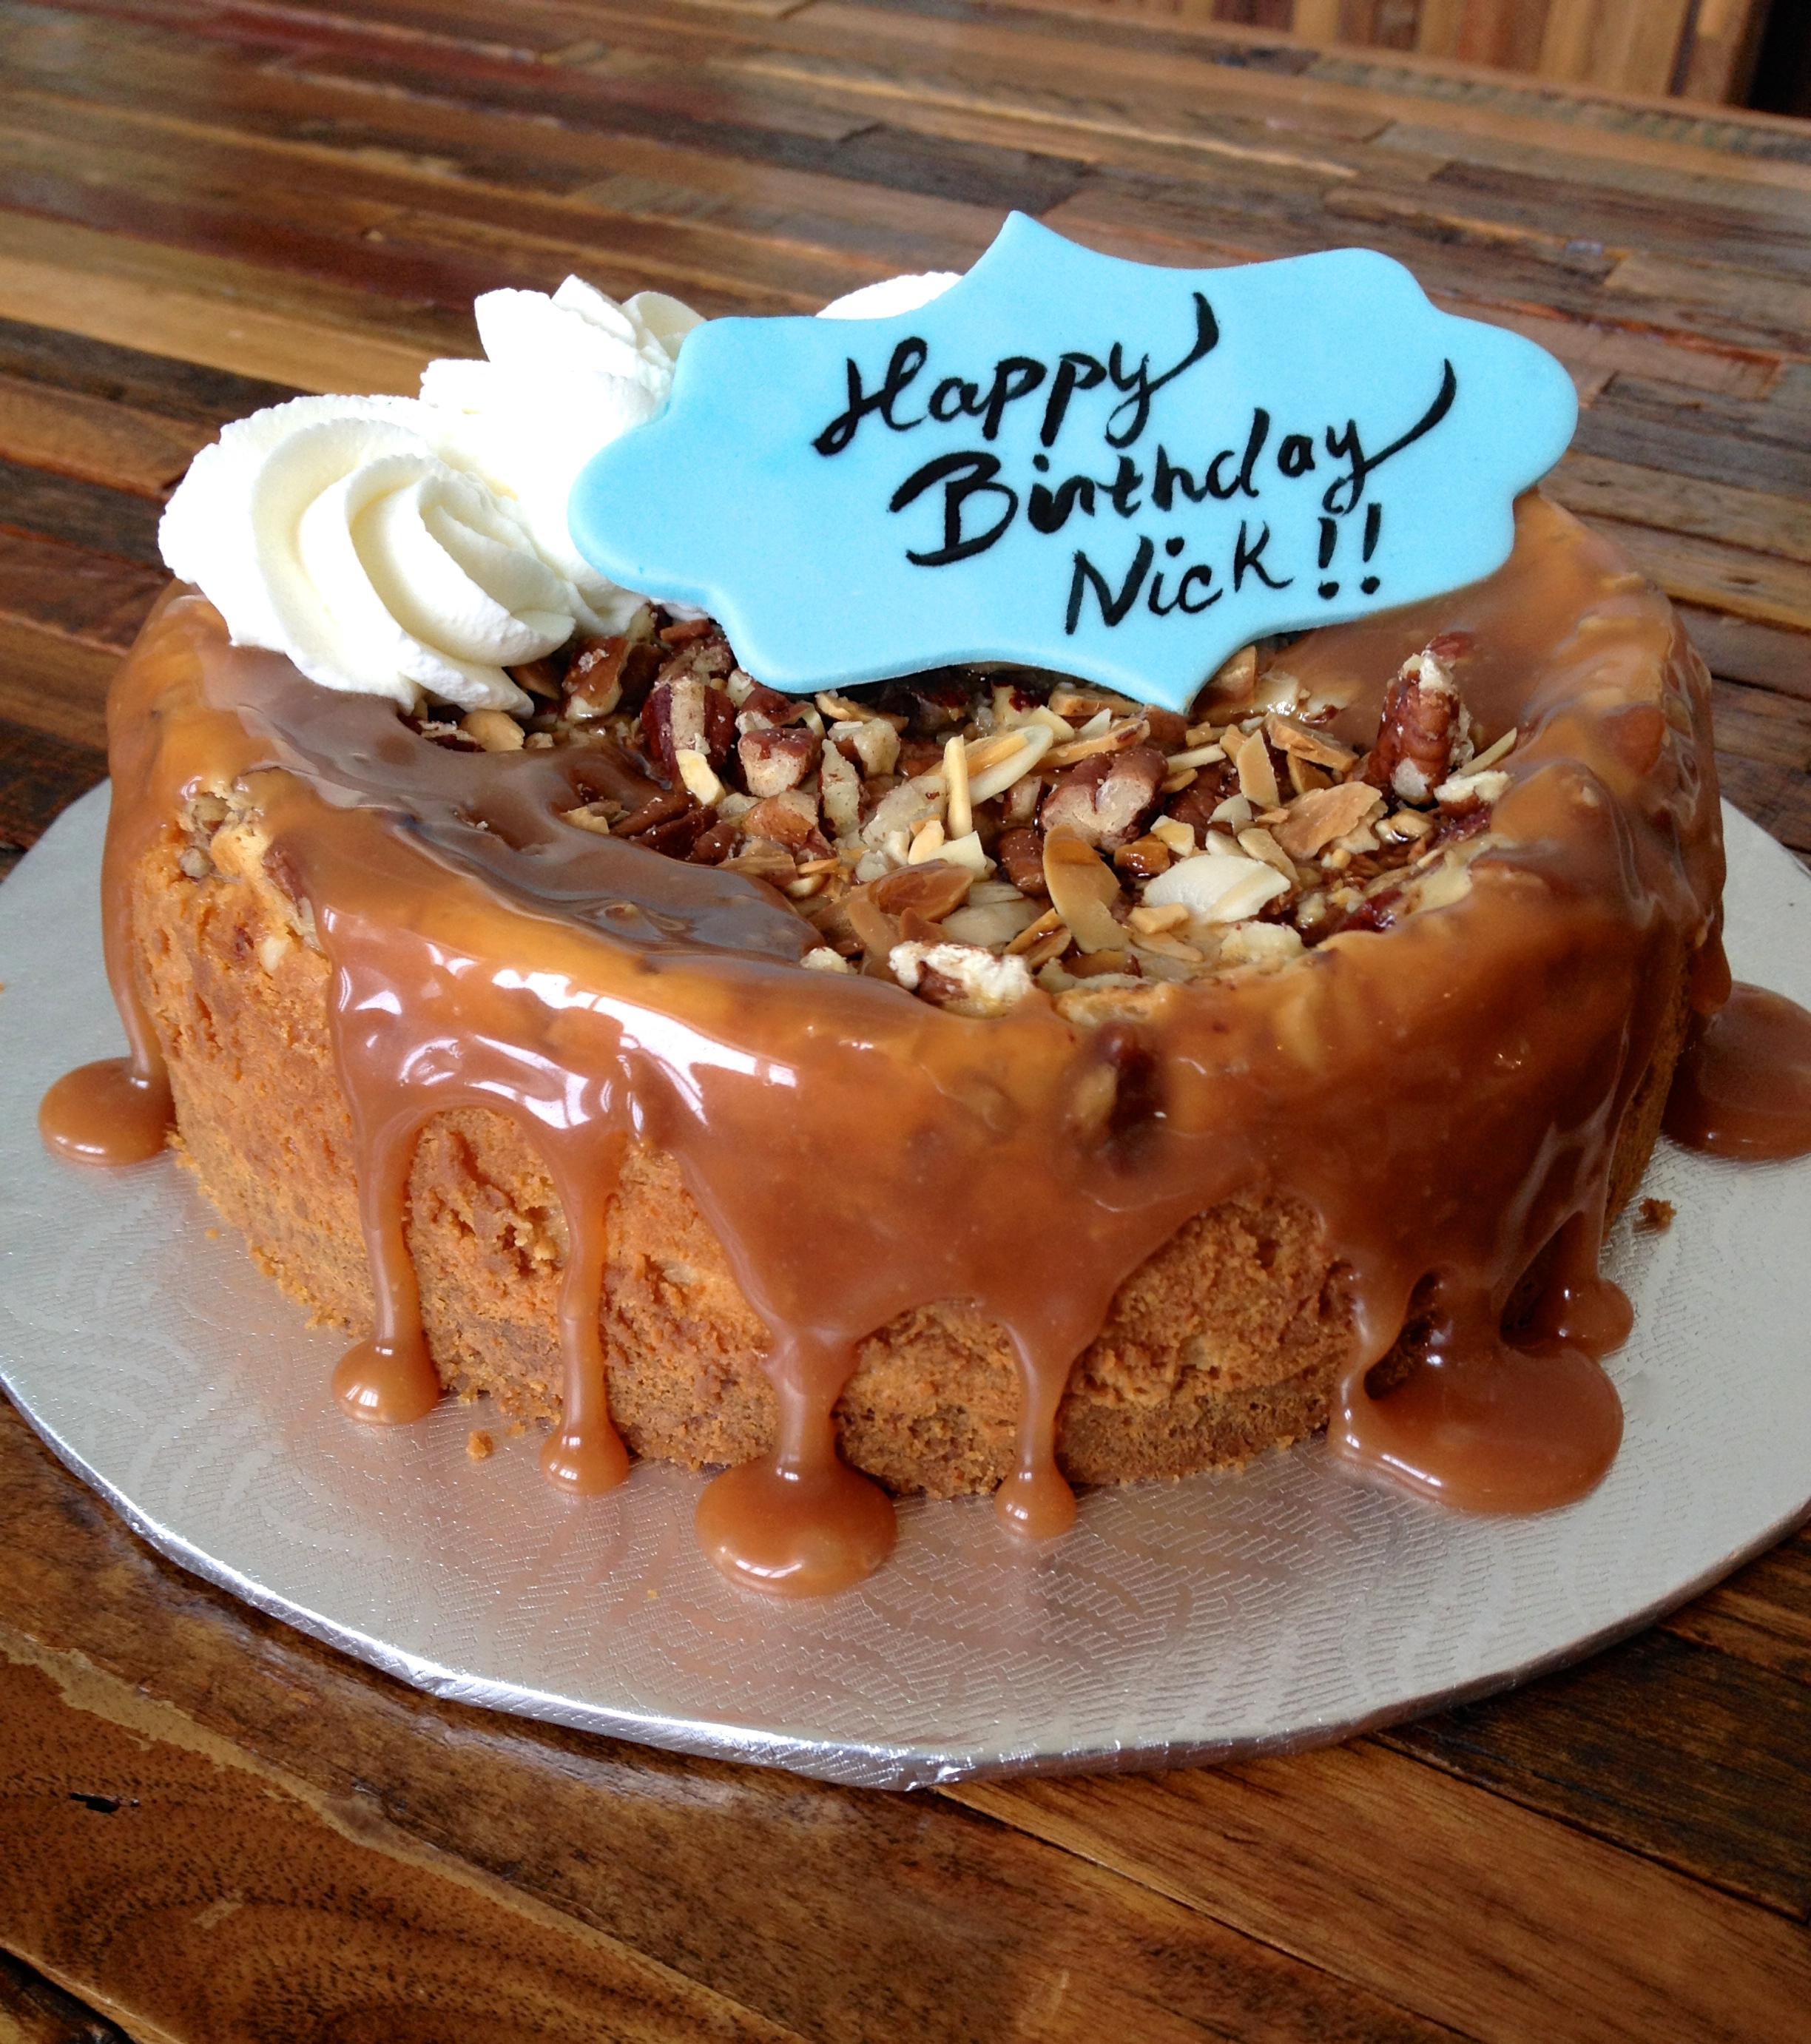 Cheesecake noix et sirop d'érable